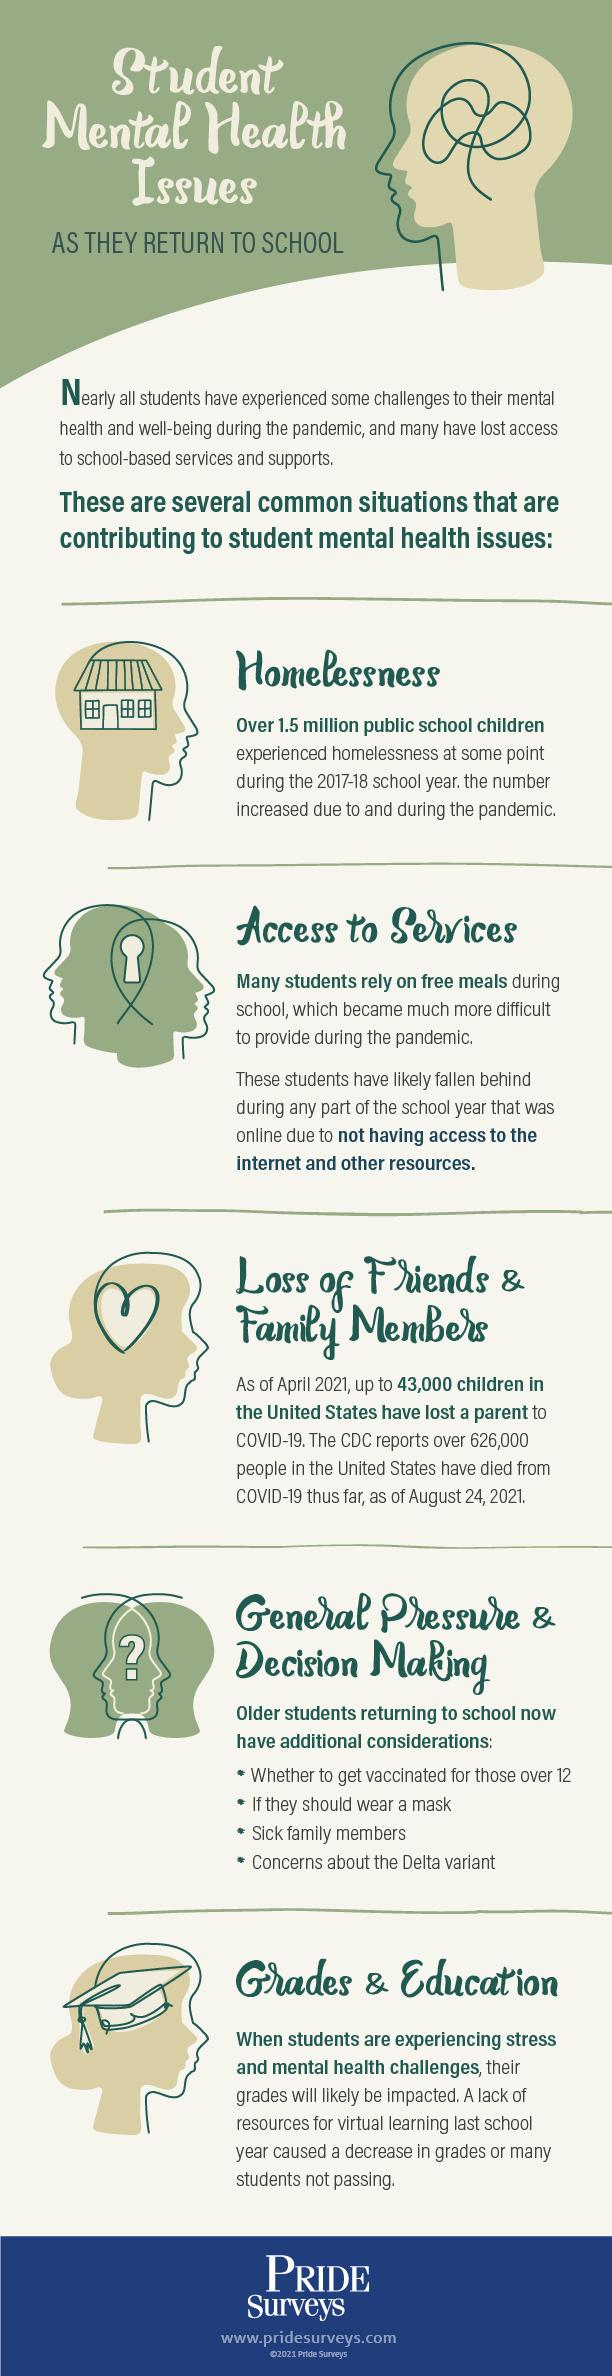 Pride Surveys Mental Health Infographic